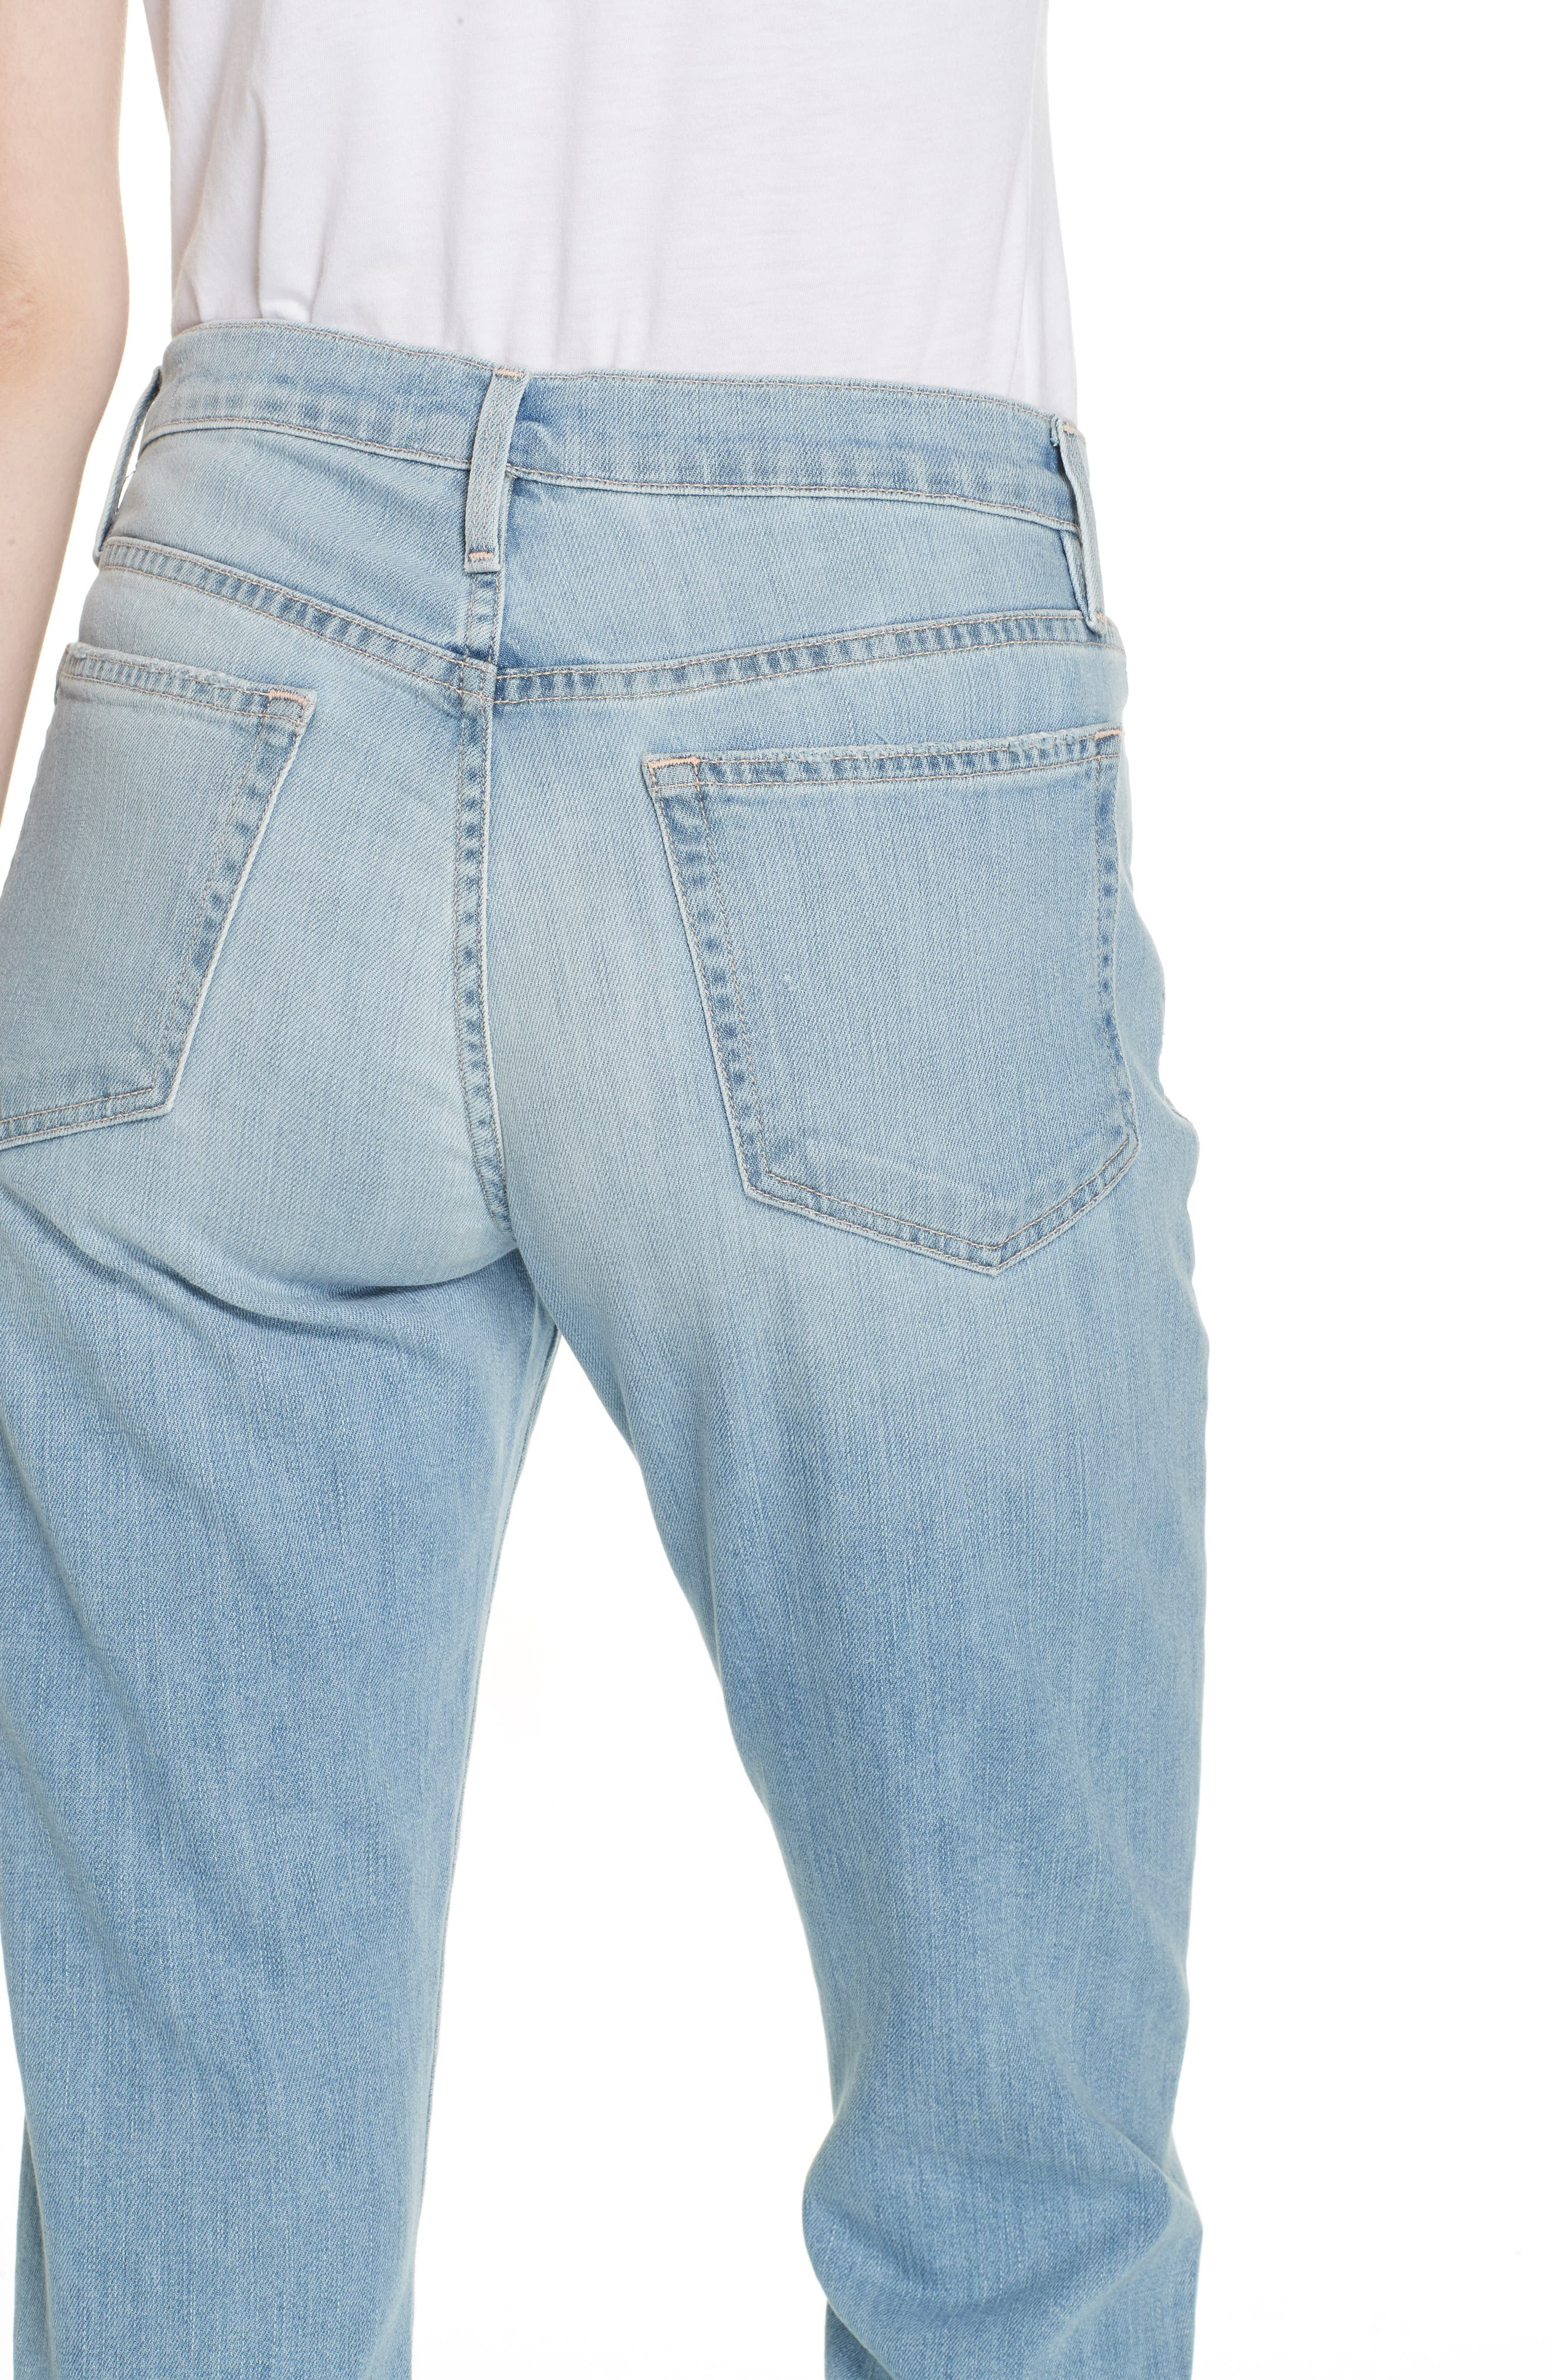 Le Boy High Waist Jeans,                             Alternate thumbnail 5, color,                             KEATON